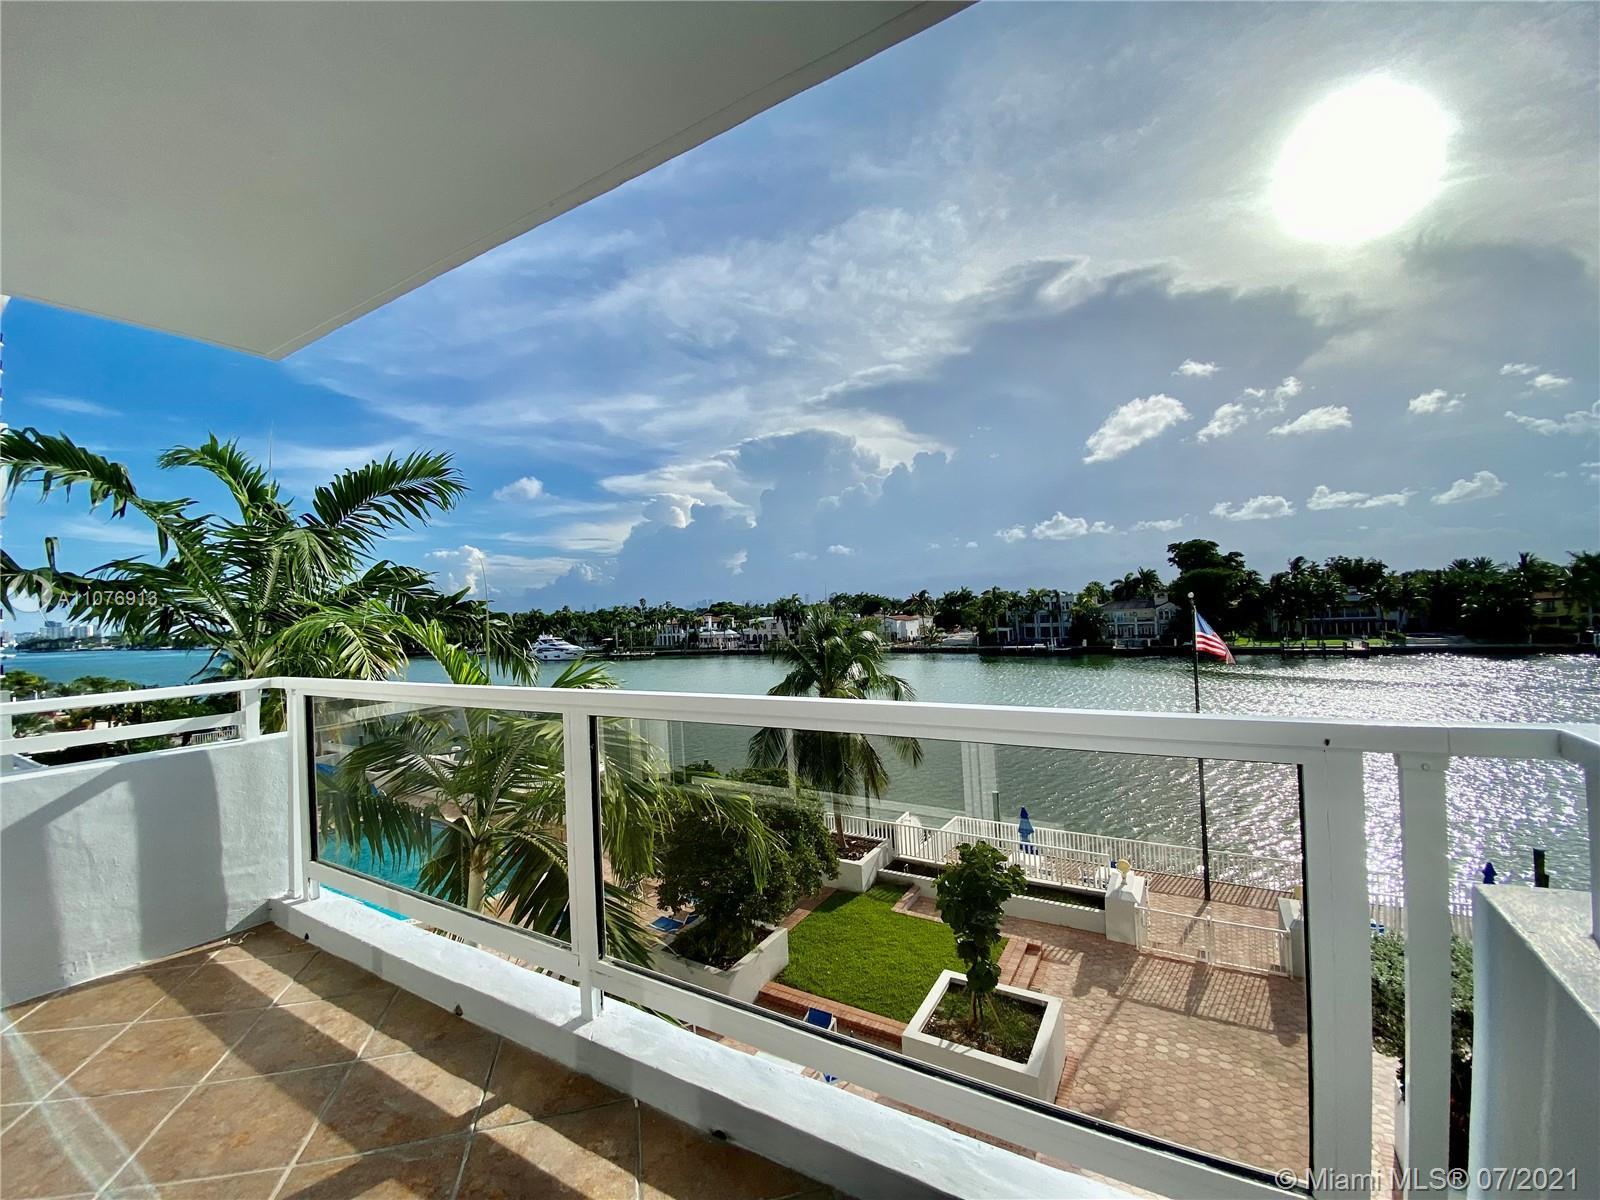 Seacoast 5700 #4H - 5700 Collins Ave #4H, Miami Beach, FL 33140